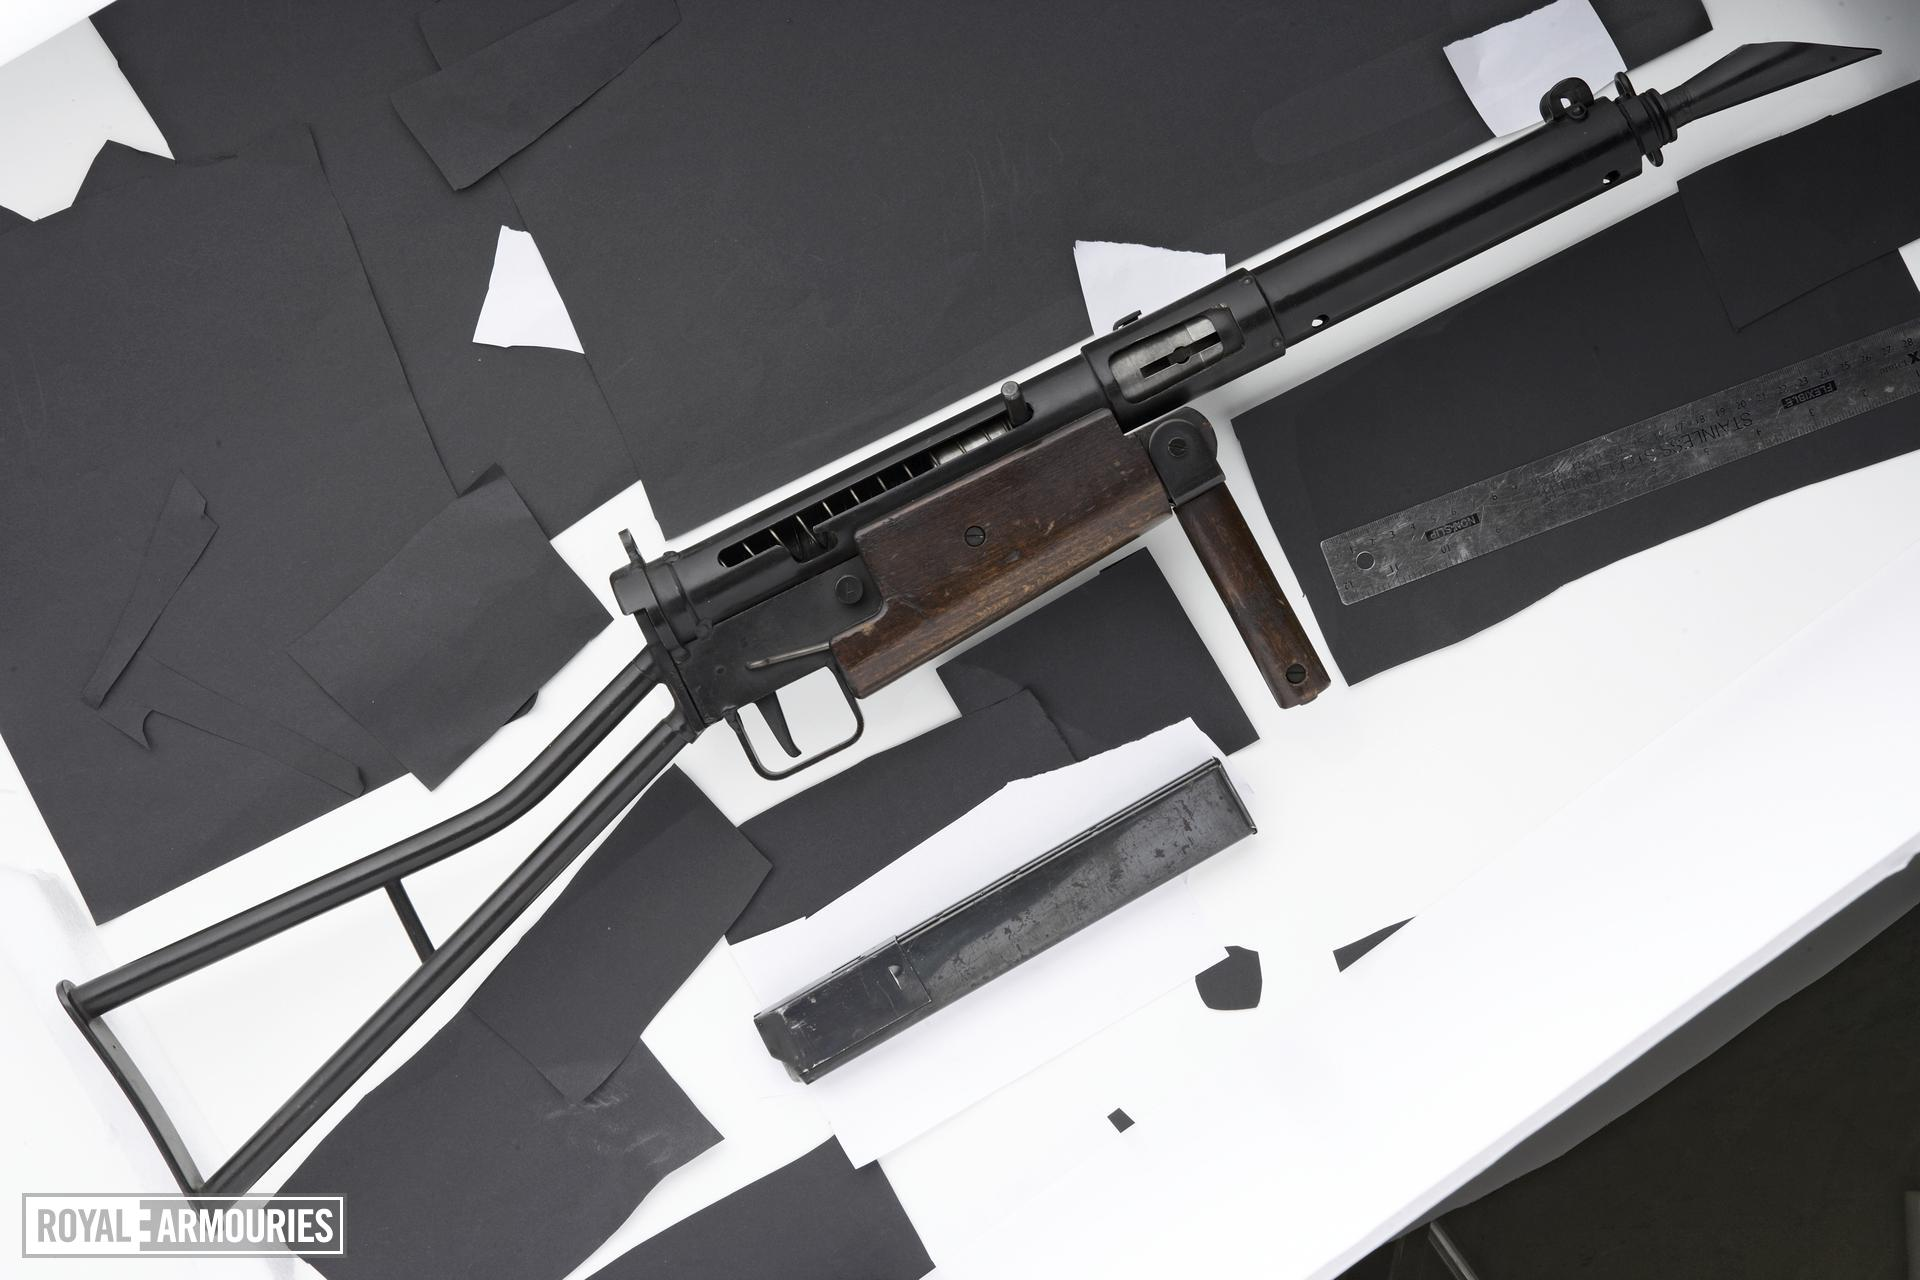 Centrefire automatic submachine gun - Sten Mk.I